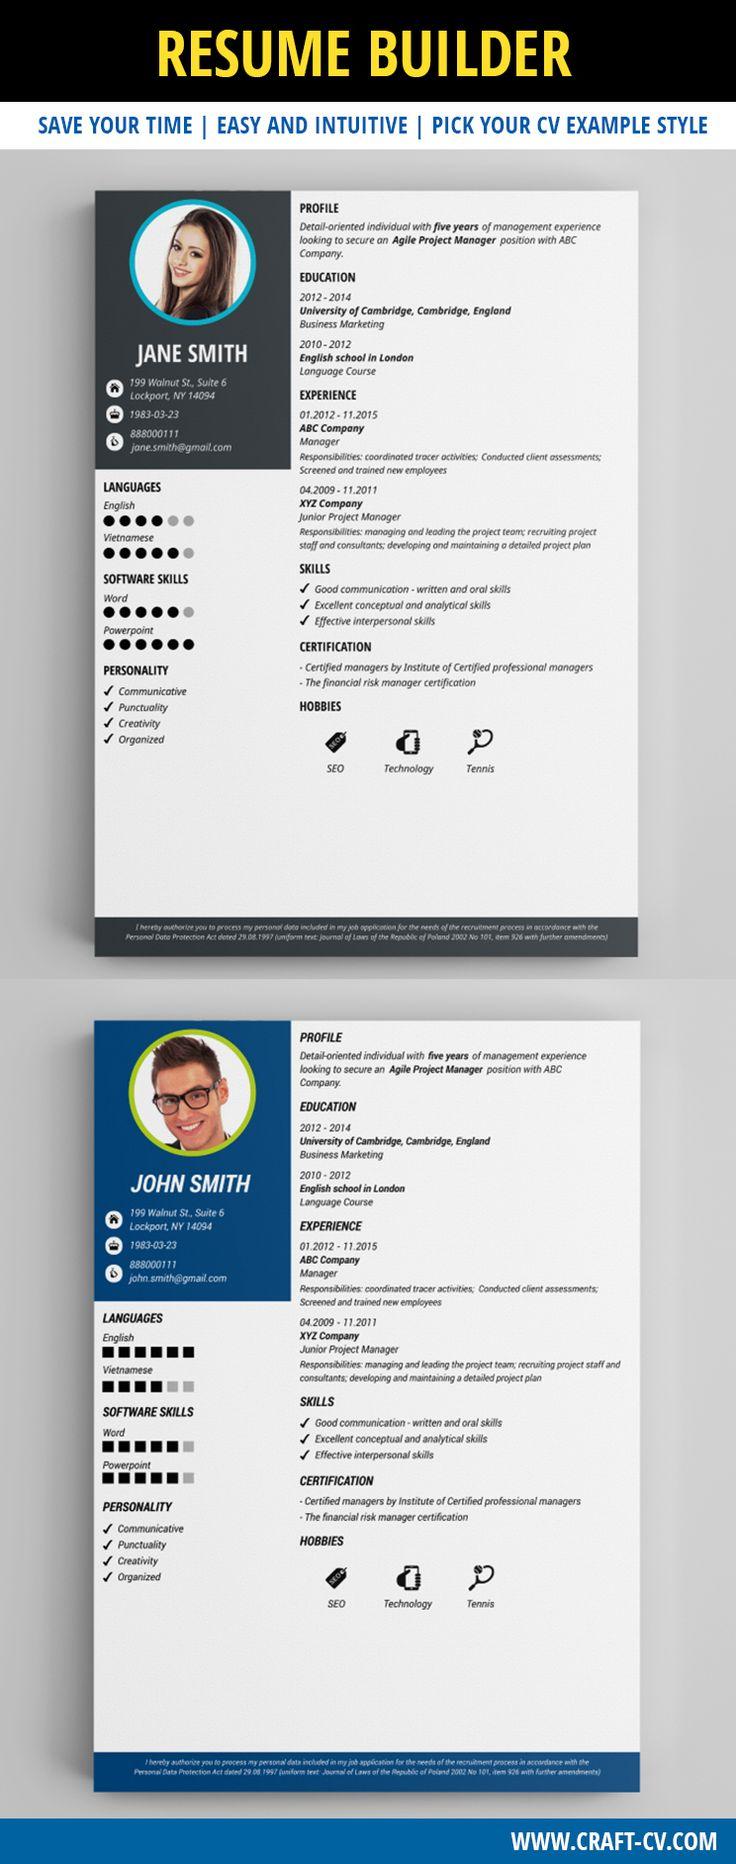 resume maker creative resumes creativeresume resumebuilder resume